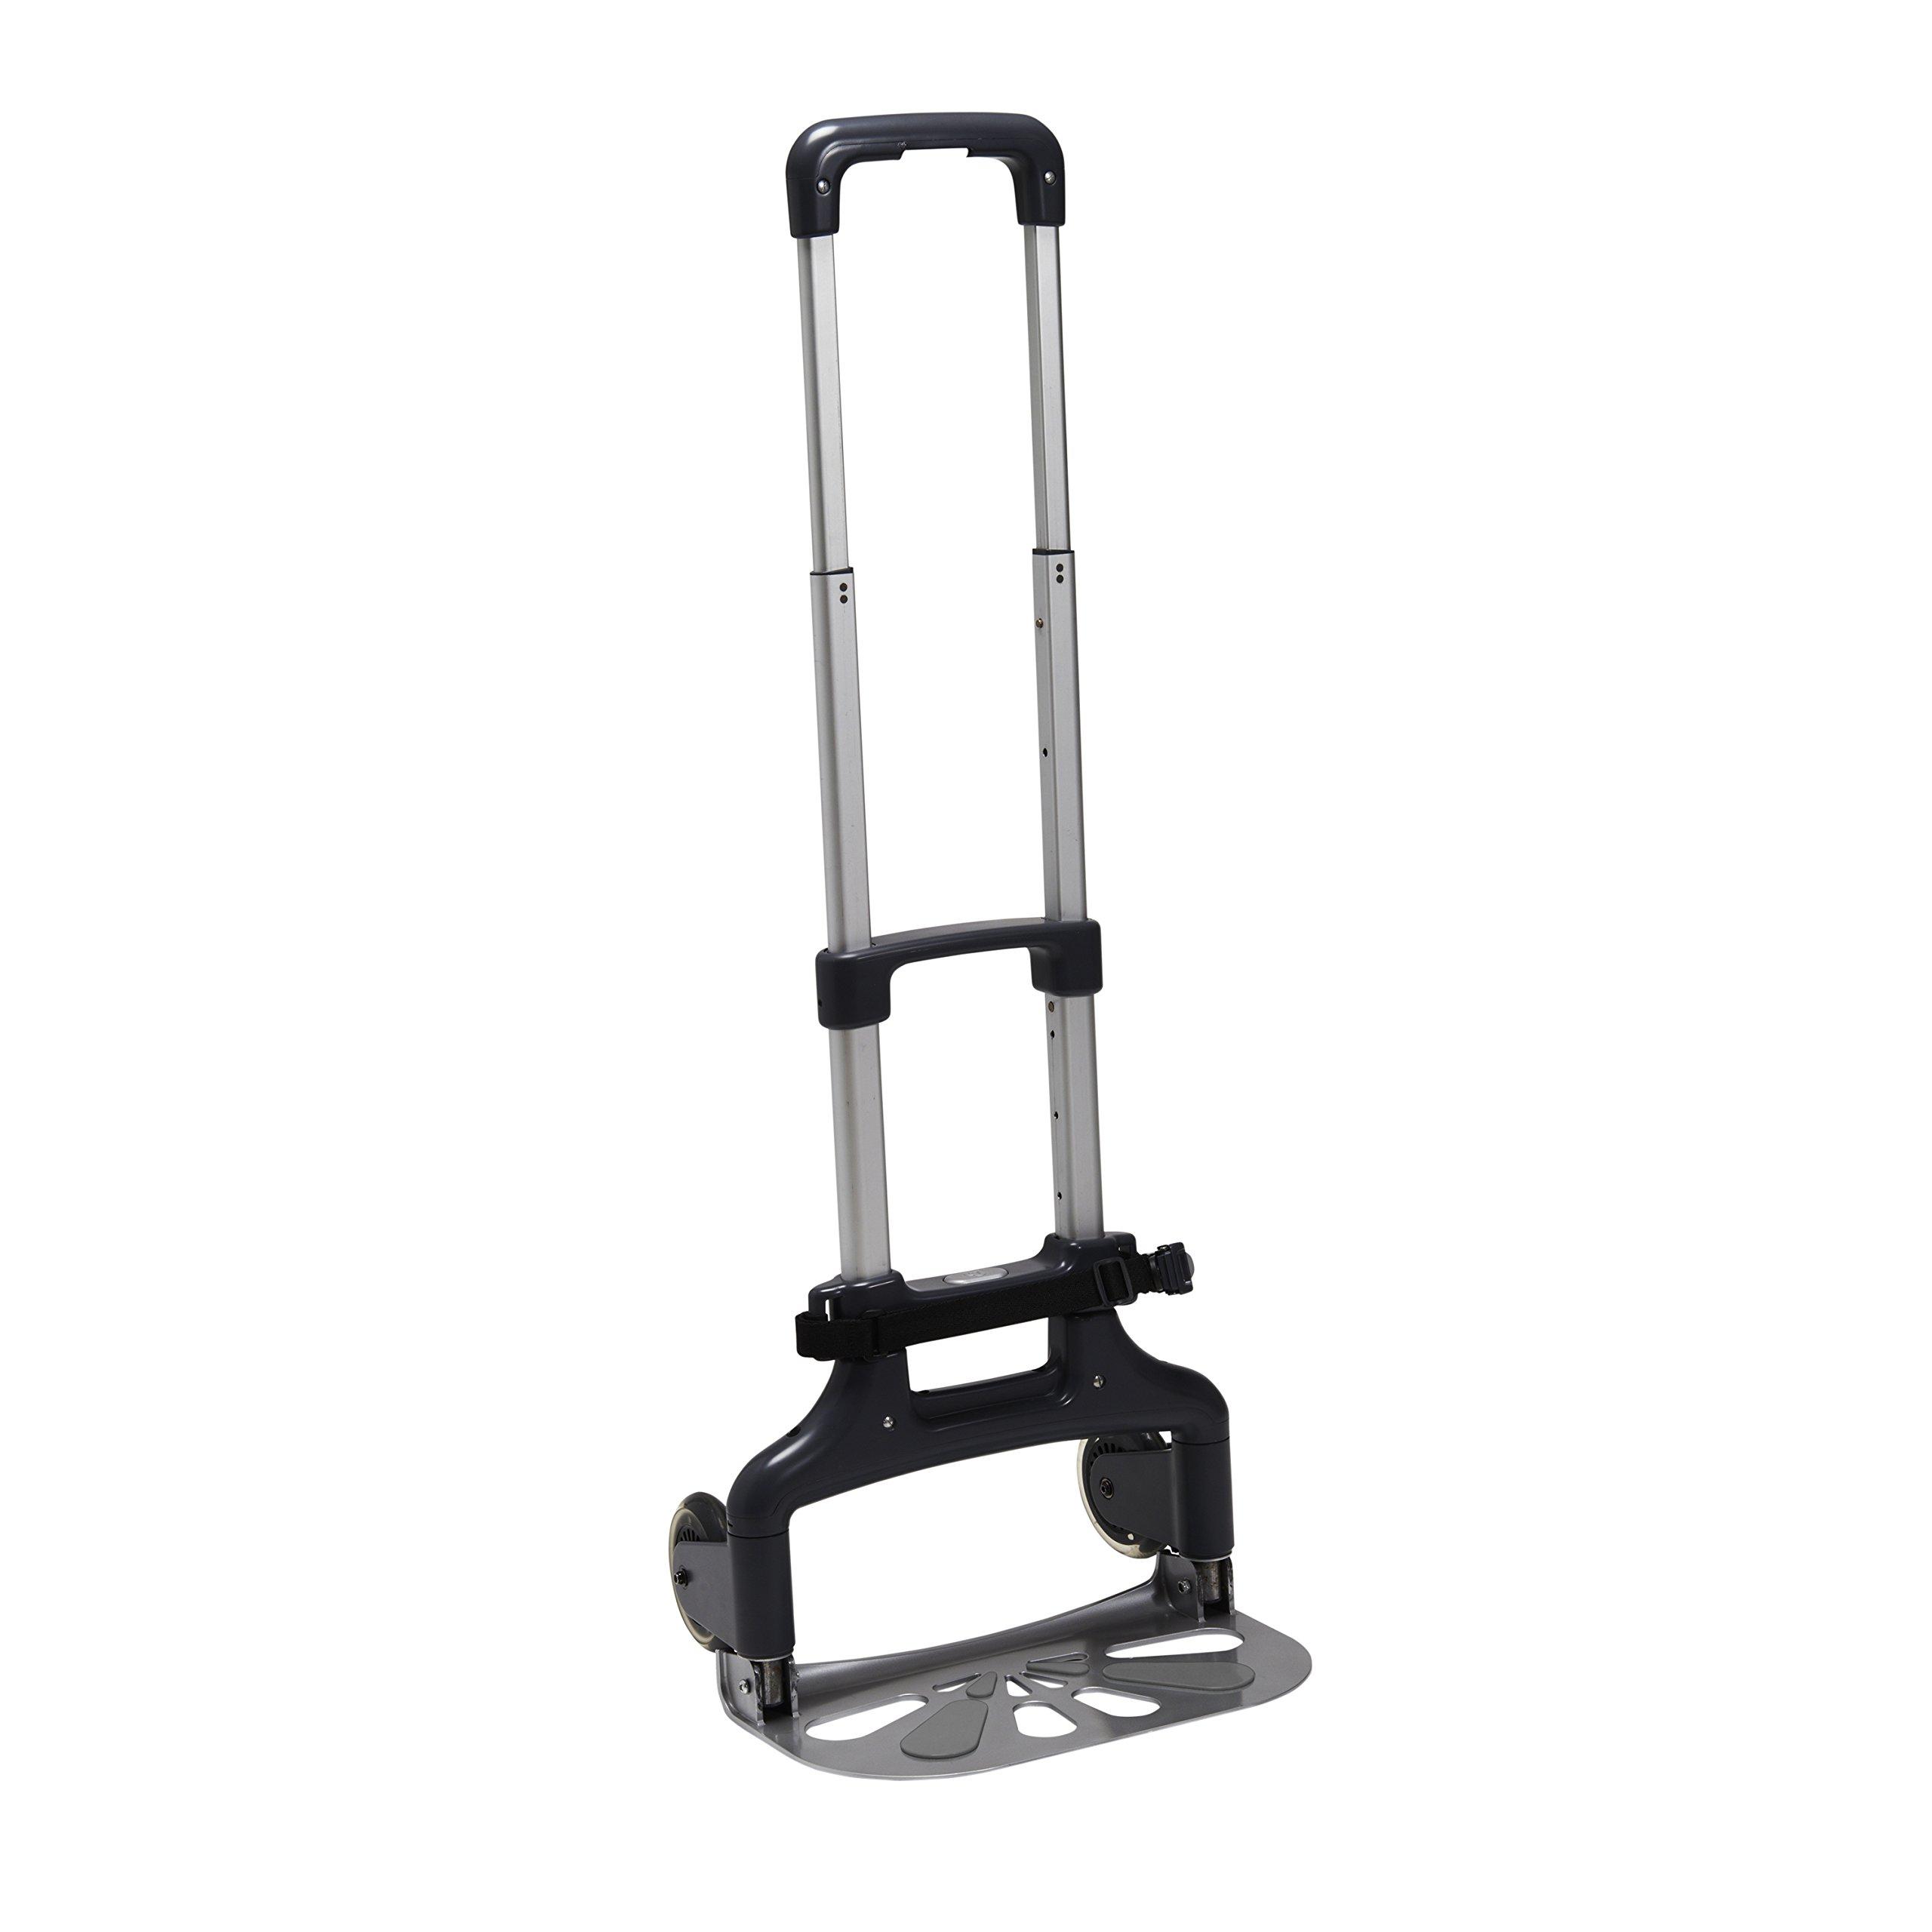 Munchkin Brica Smart Move Car Seat Travel Cart, Airport Transporter, Grey by Munchkin